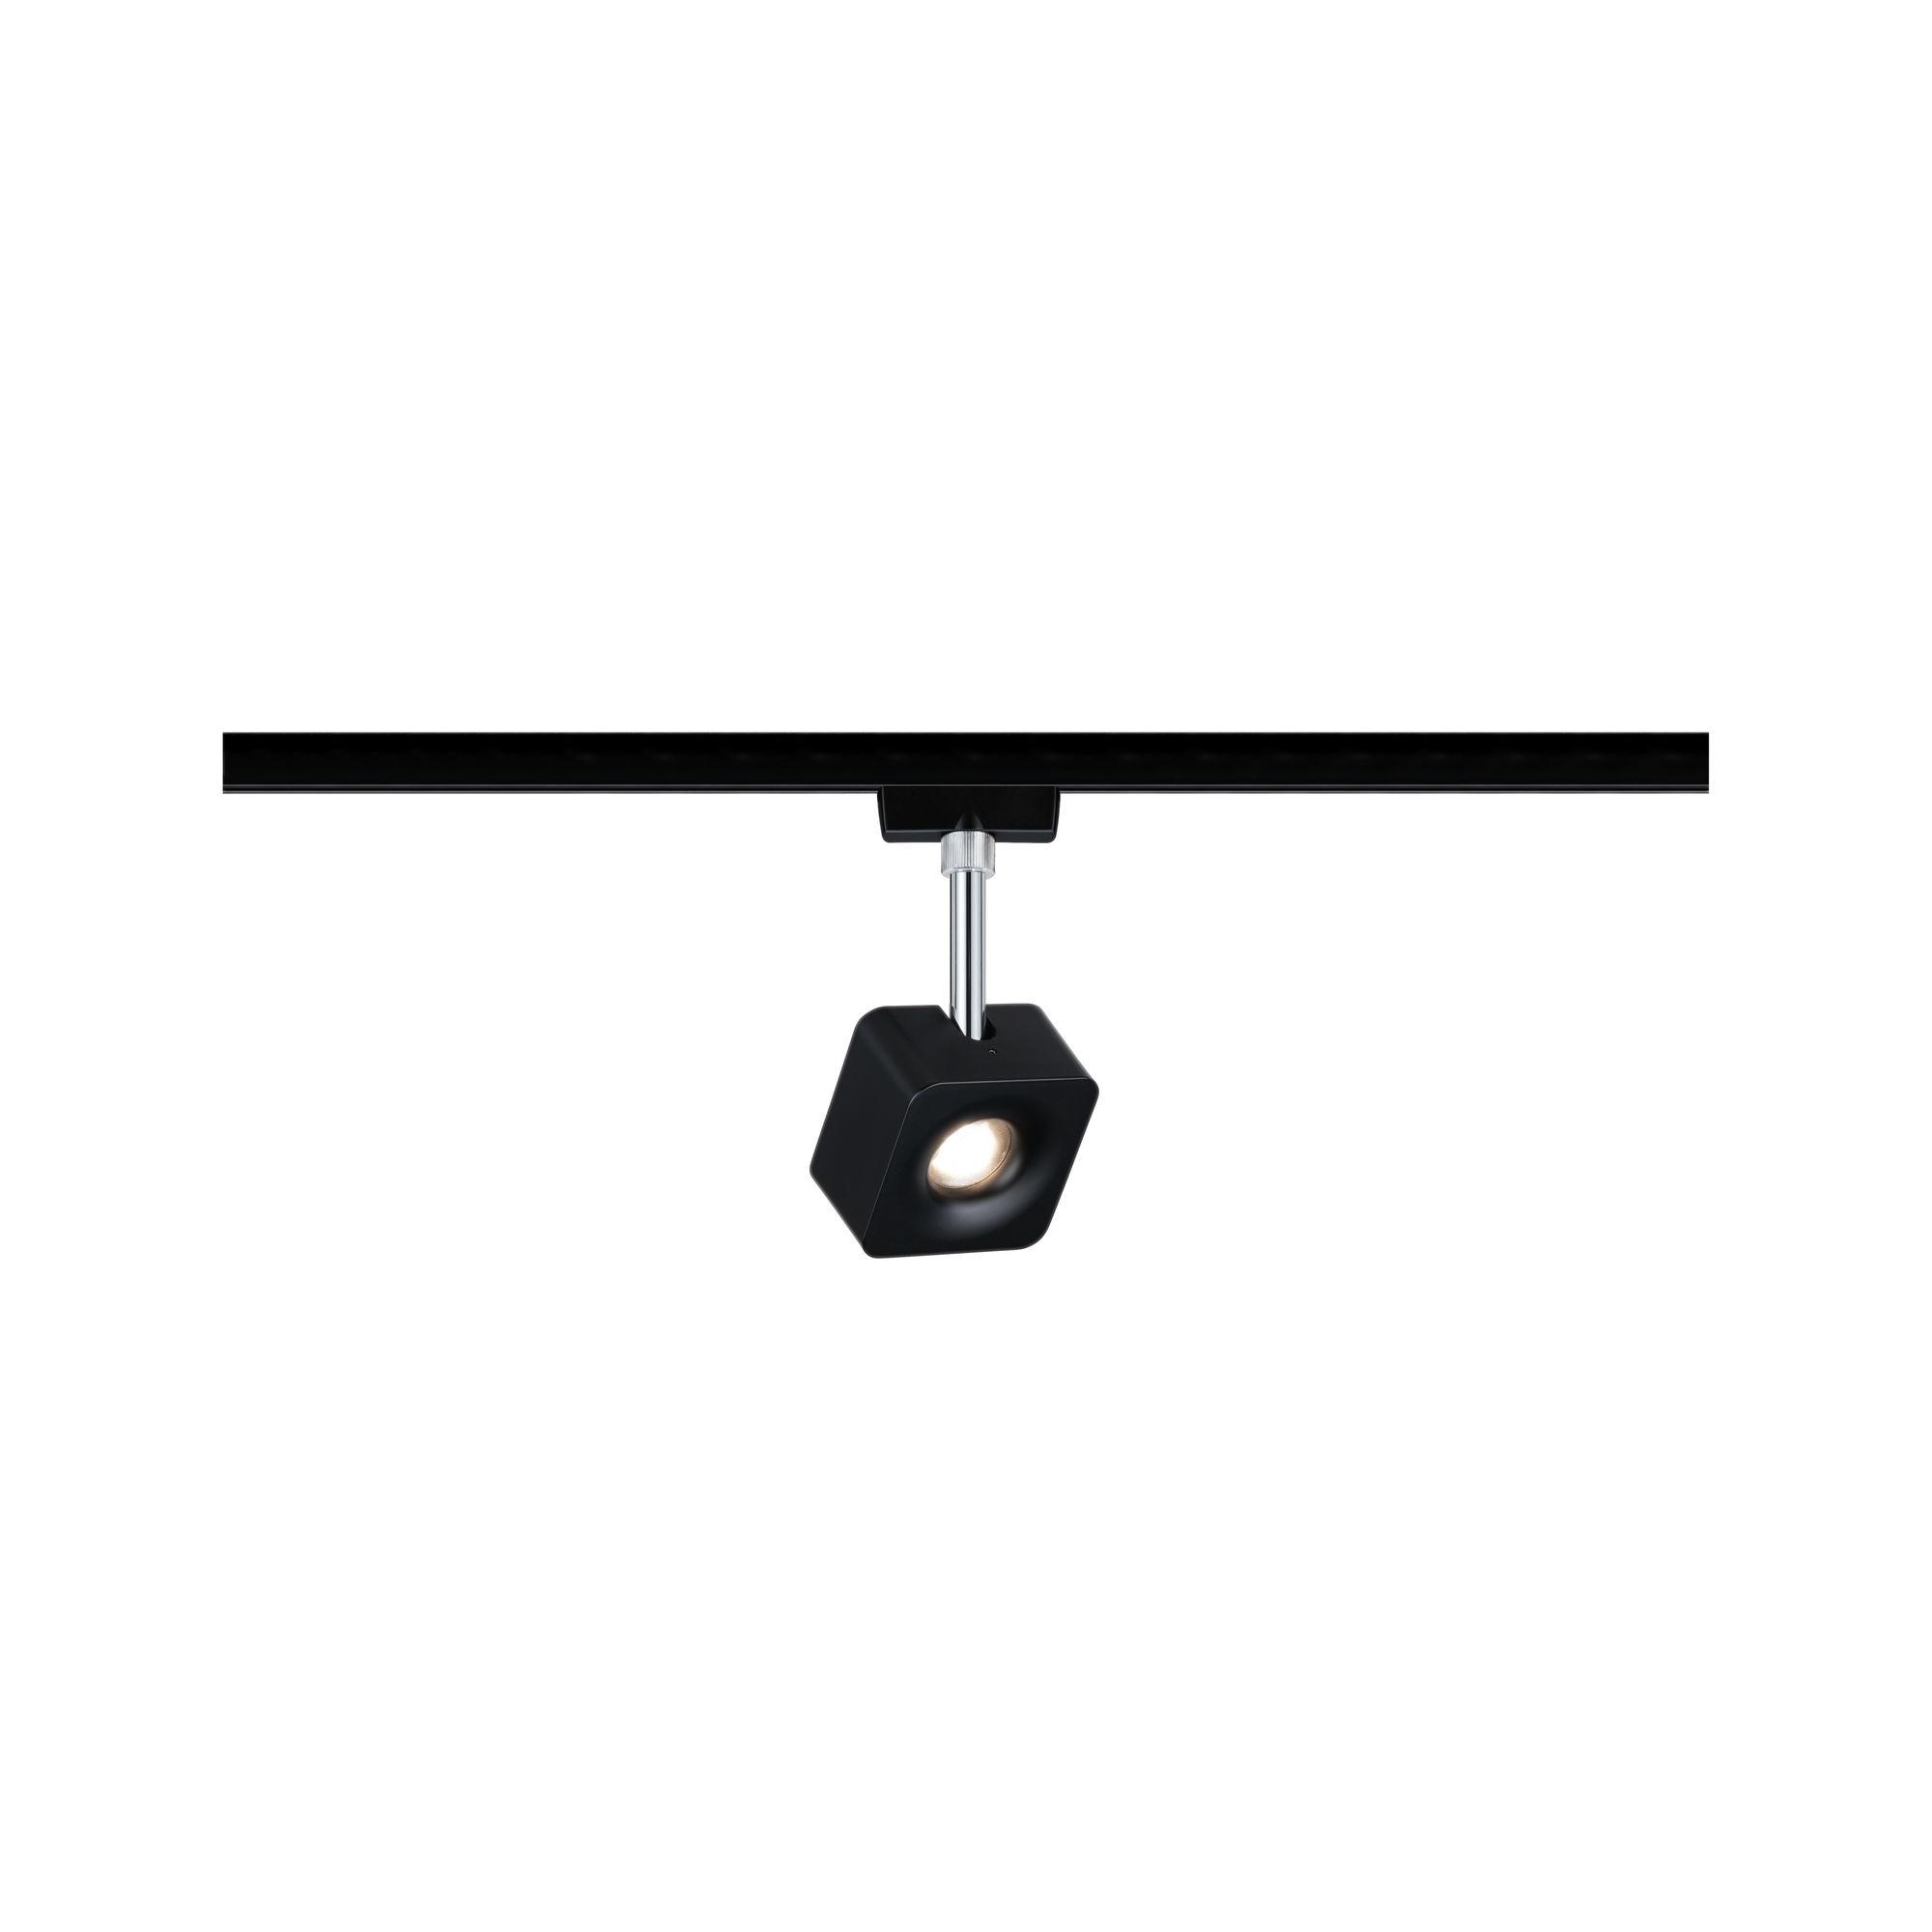 Paulmann URail Spot Cube 1x8W Schwarz matt Chrom 230V Met/Kst 2700K dimmbar